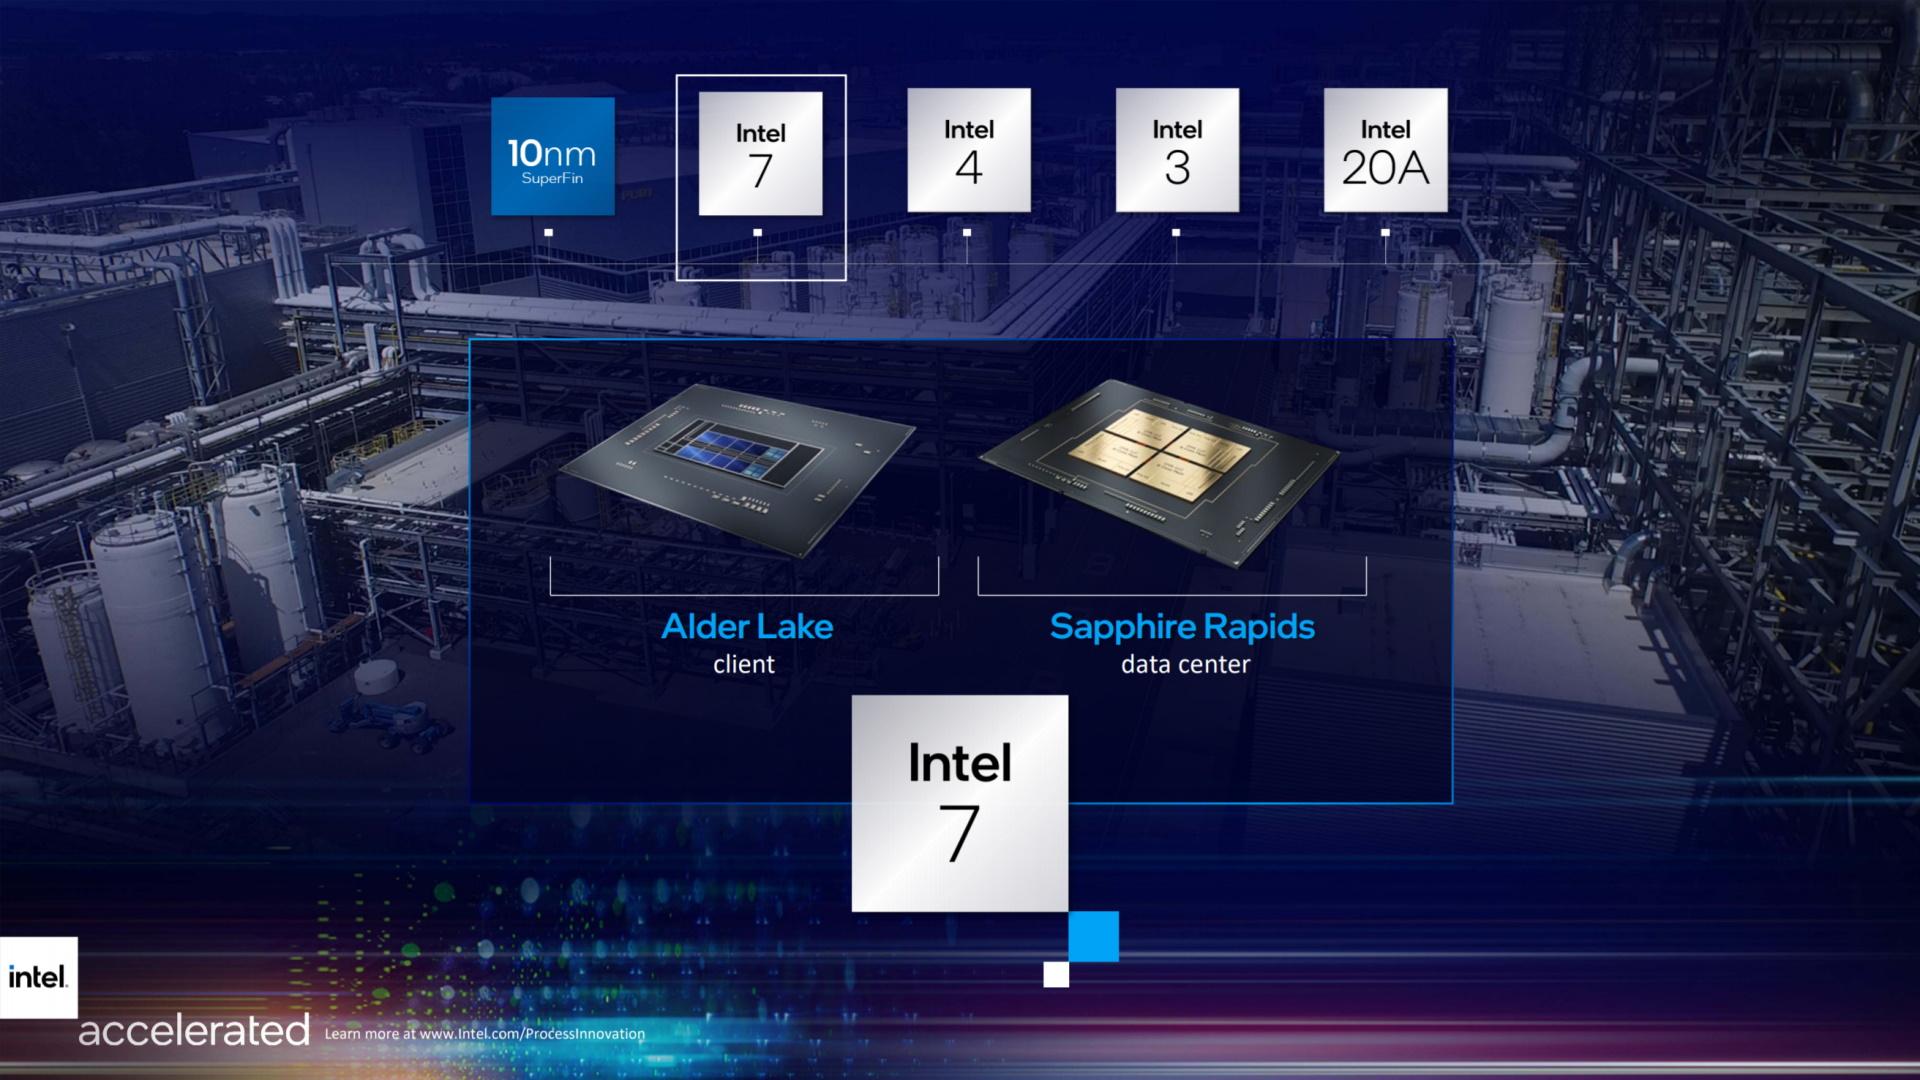 Intel Alder Lake will use the Intel 7 process node